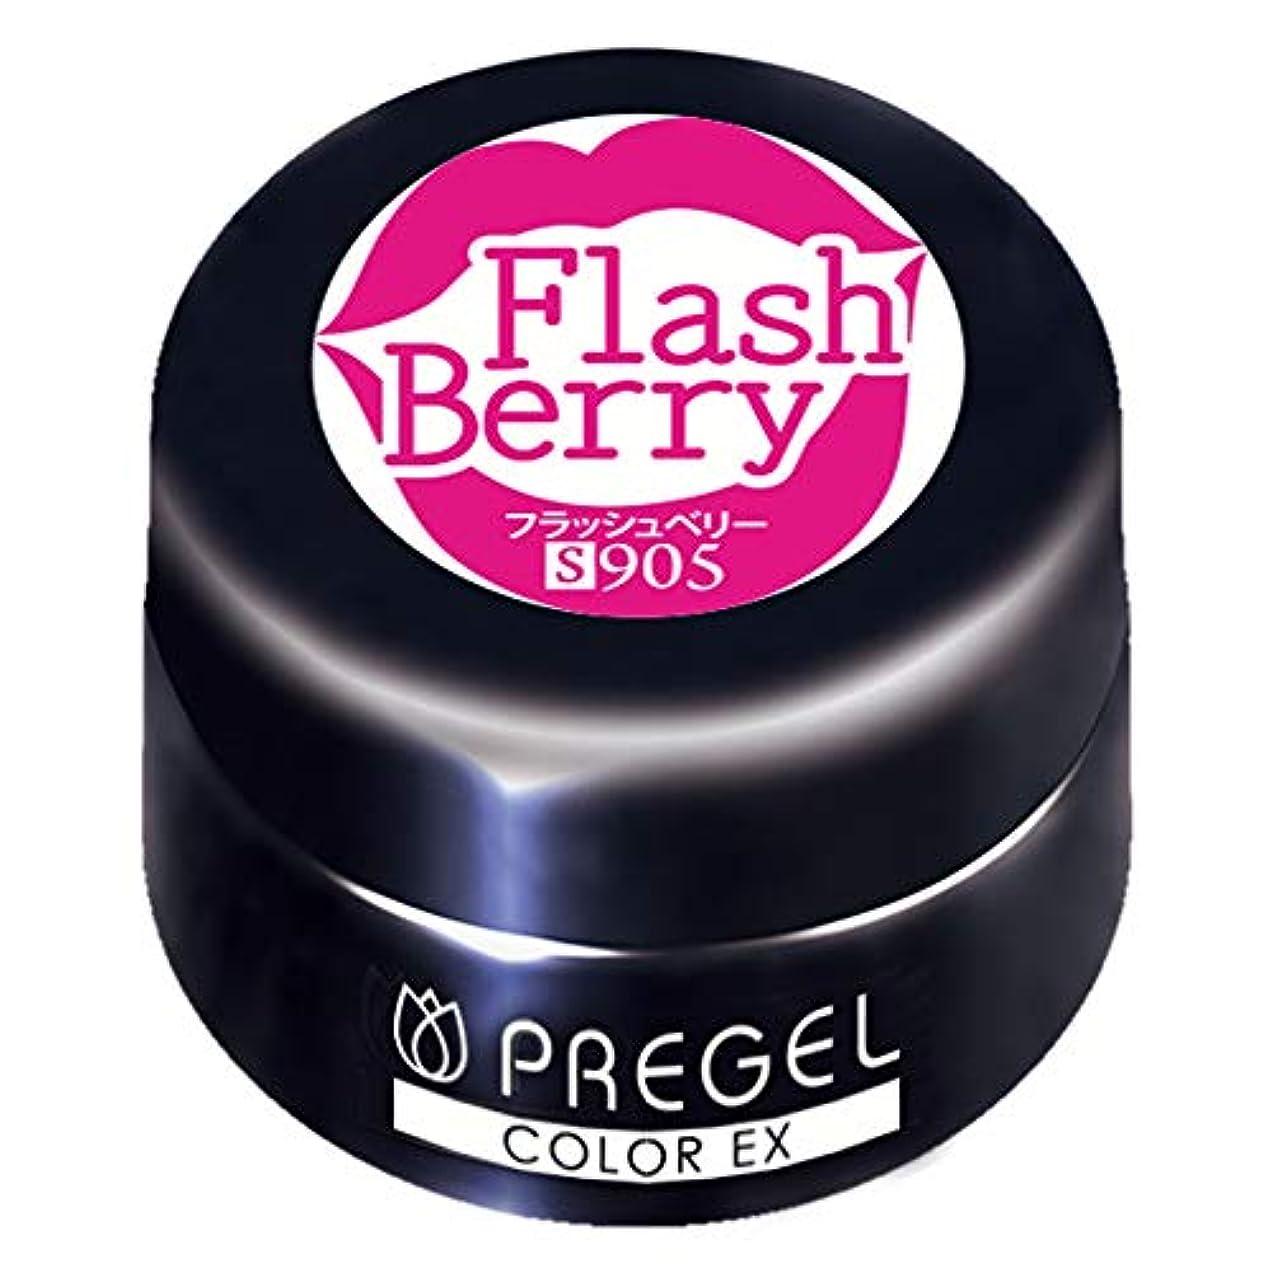 PRE GELカラーEX フラッシュベリー 3g PG-CE905